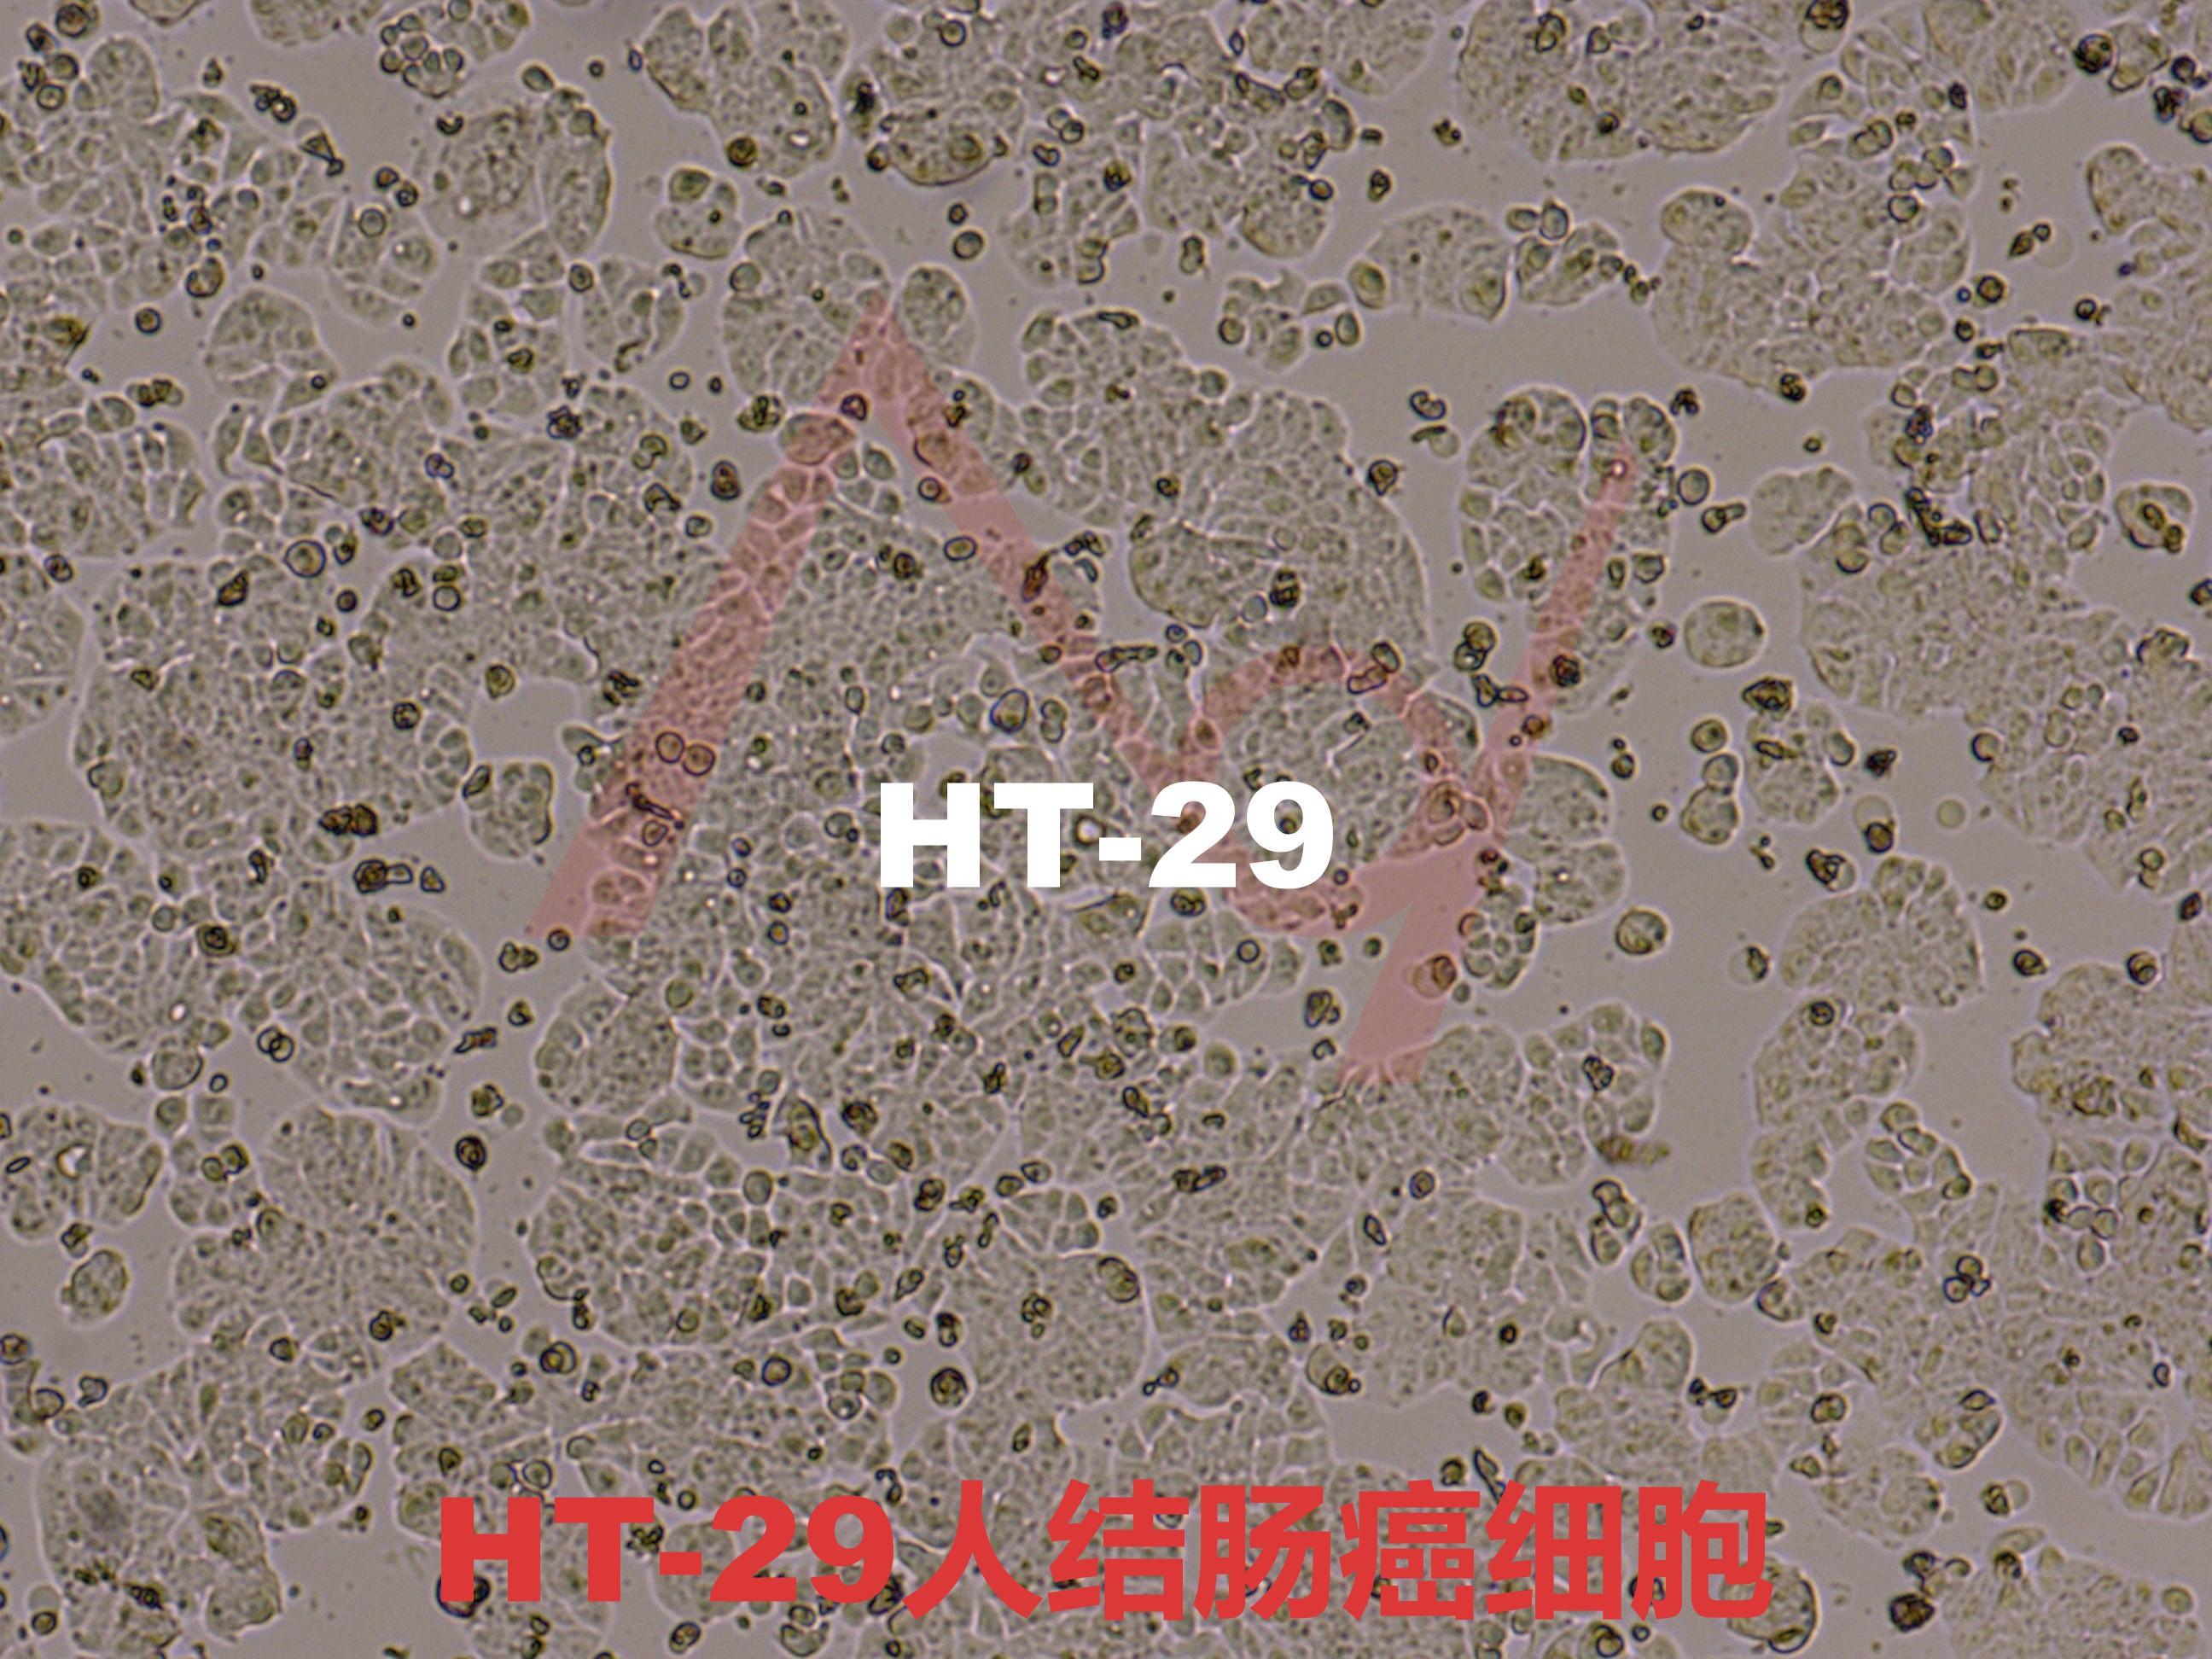 HT-29[HT 29; HT29]人结肠癌细胞